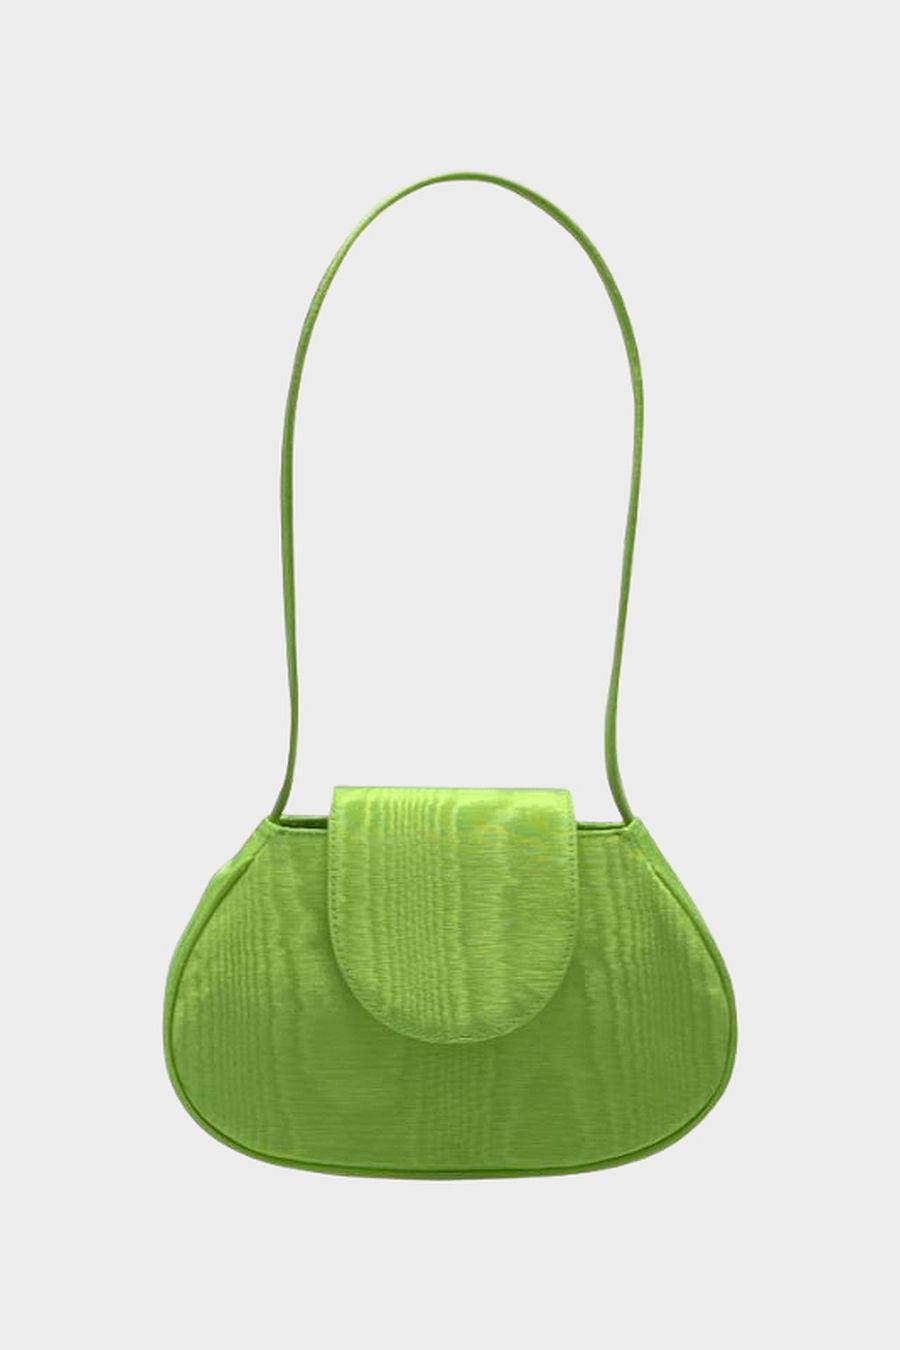 For The Ages New York Ineva Baguette - Green Apple